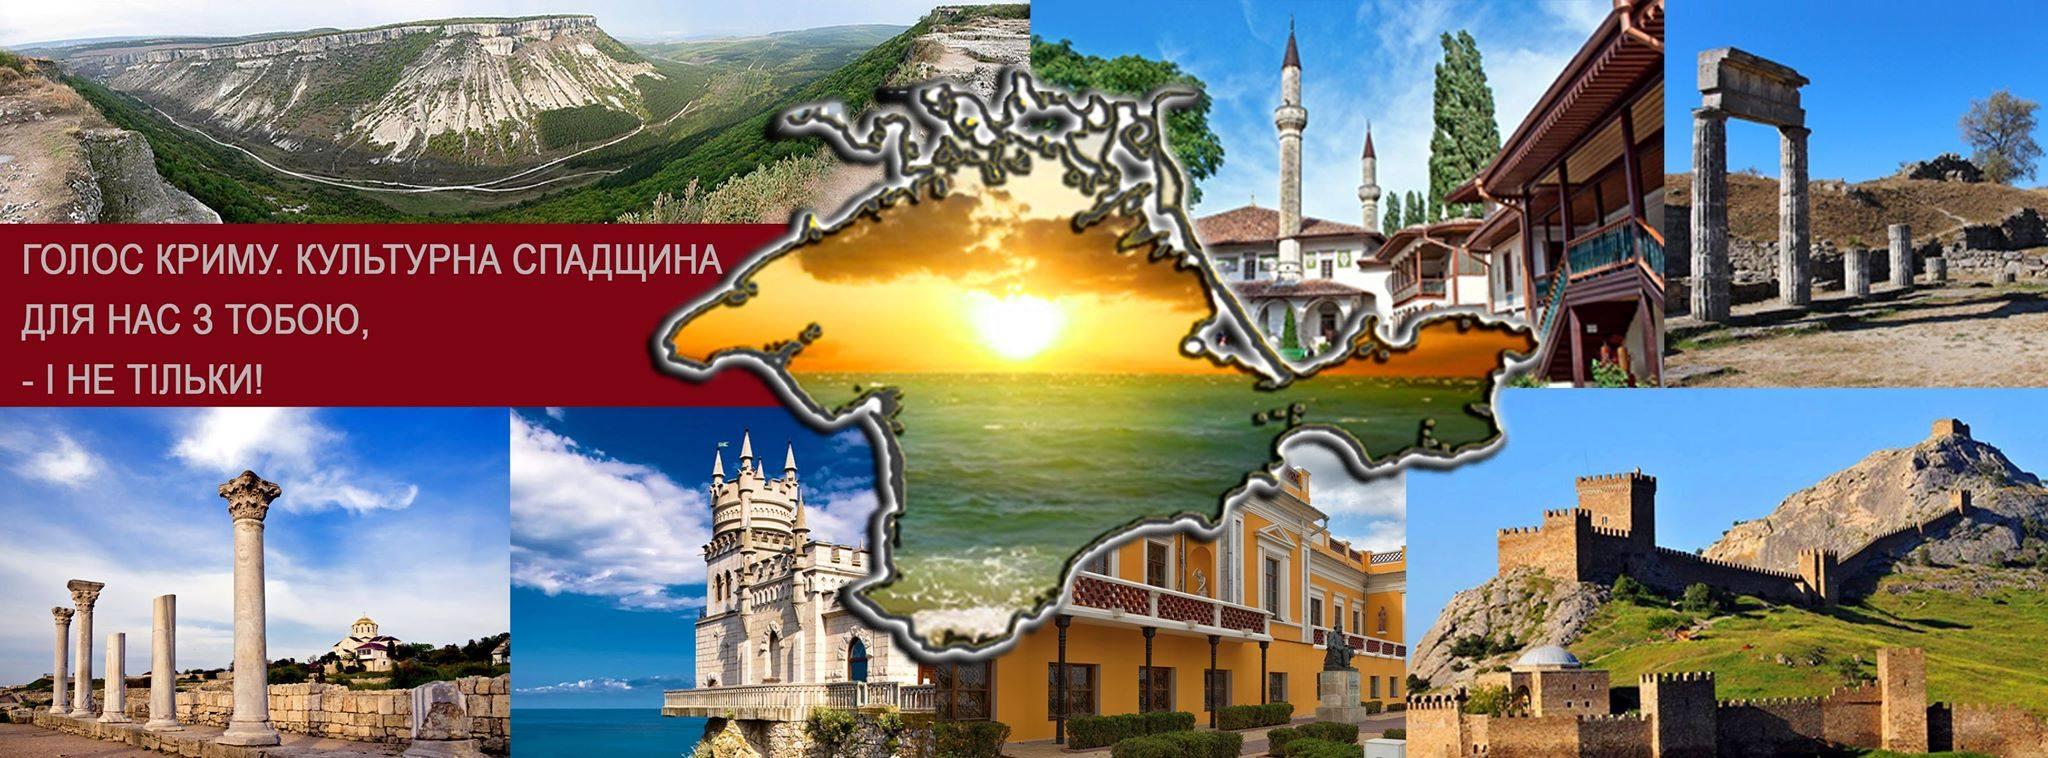 Голос Криму. Культура